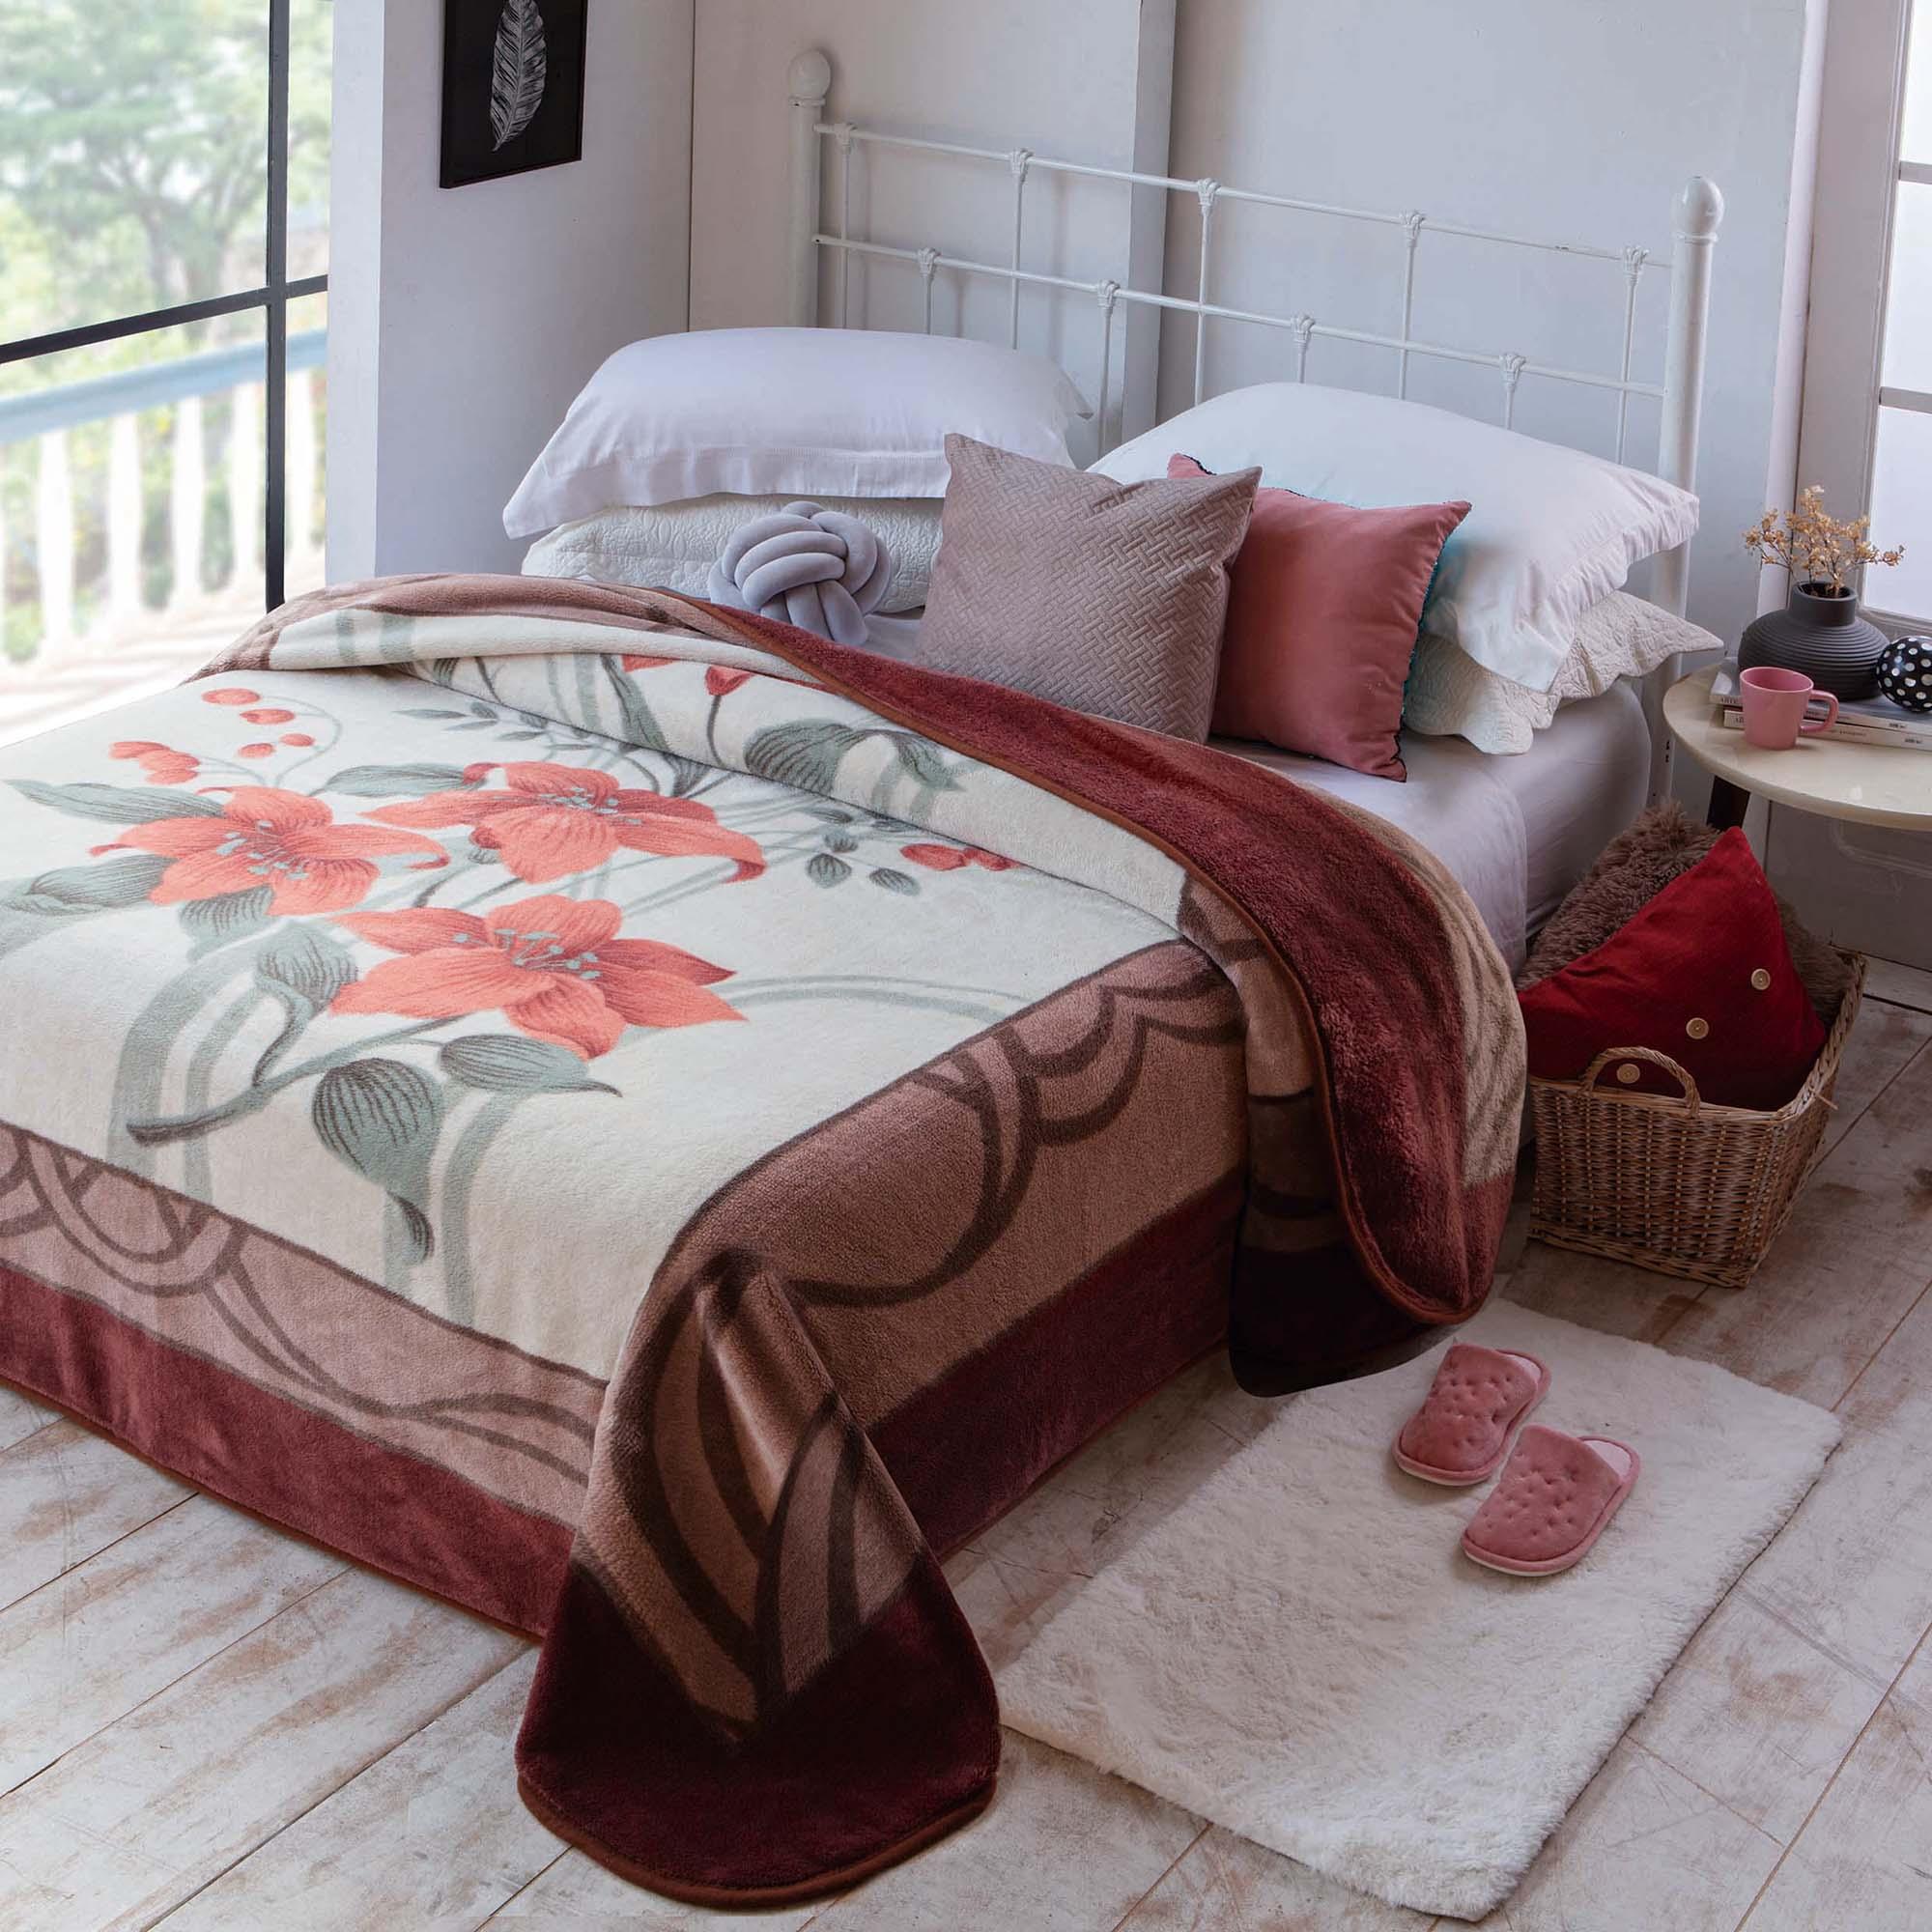 Cobertor Jolitex Casal Kyor Plus 1,80x2,20m Acores